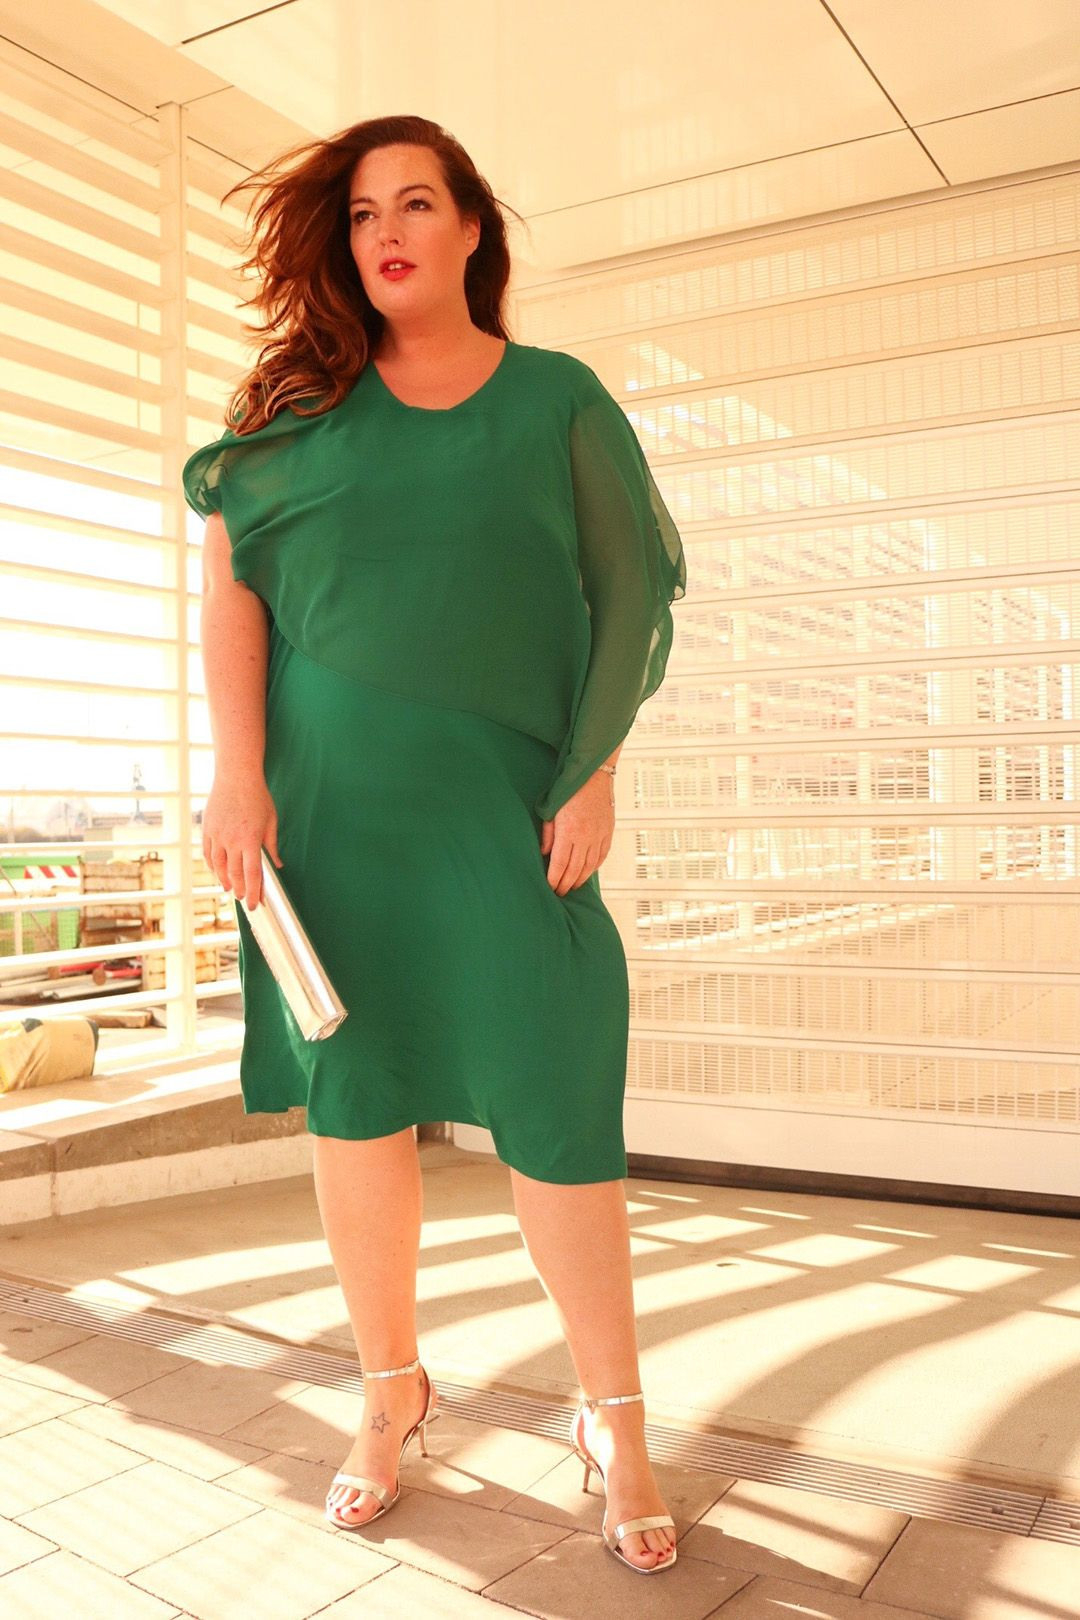 13 Luxurius Grünes Kleid A Linie Spezialgebiet17 Schön Grünes Kleid A Linie Design